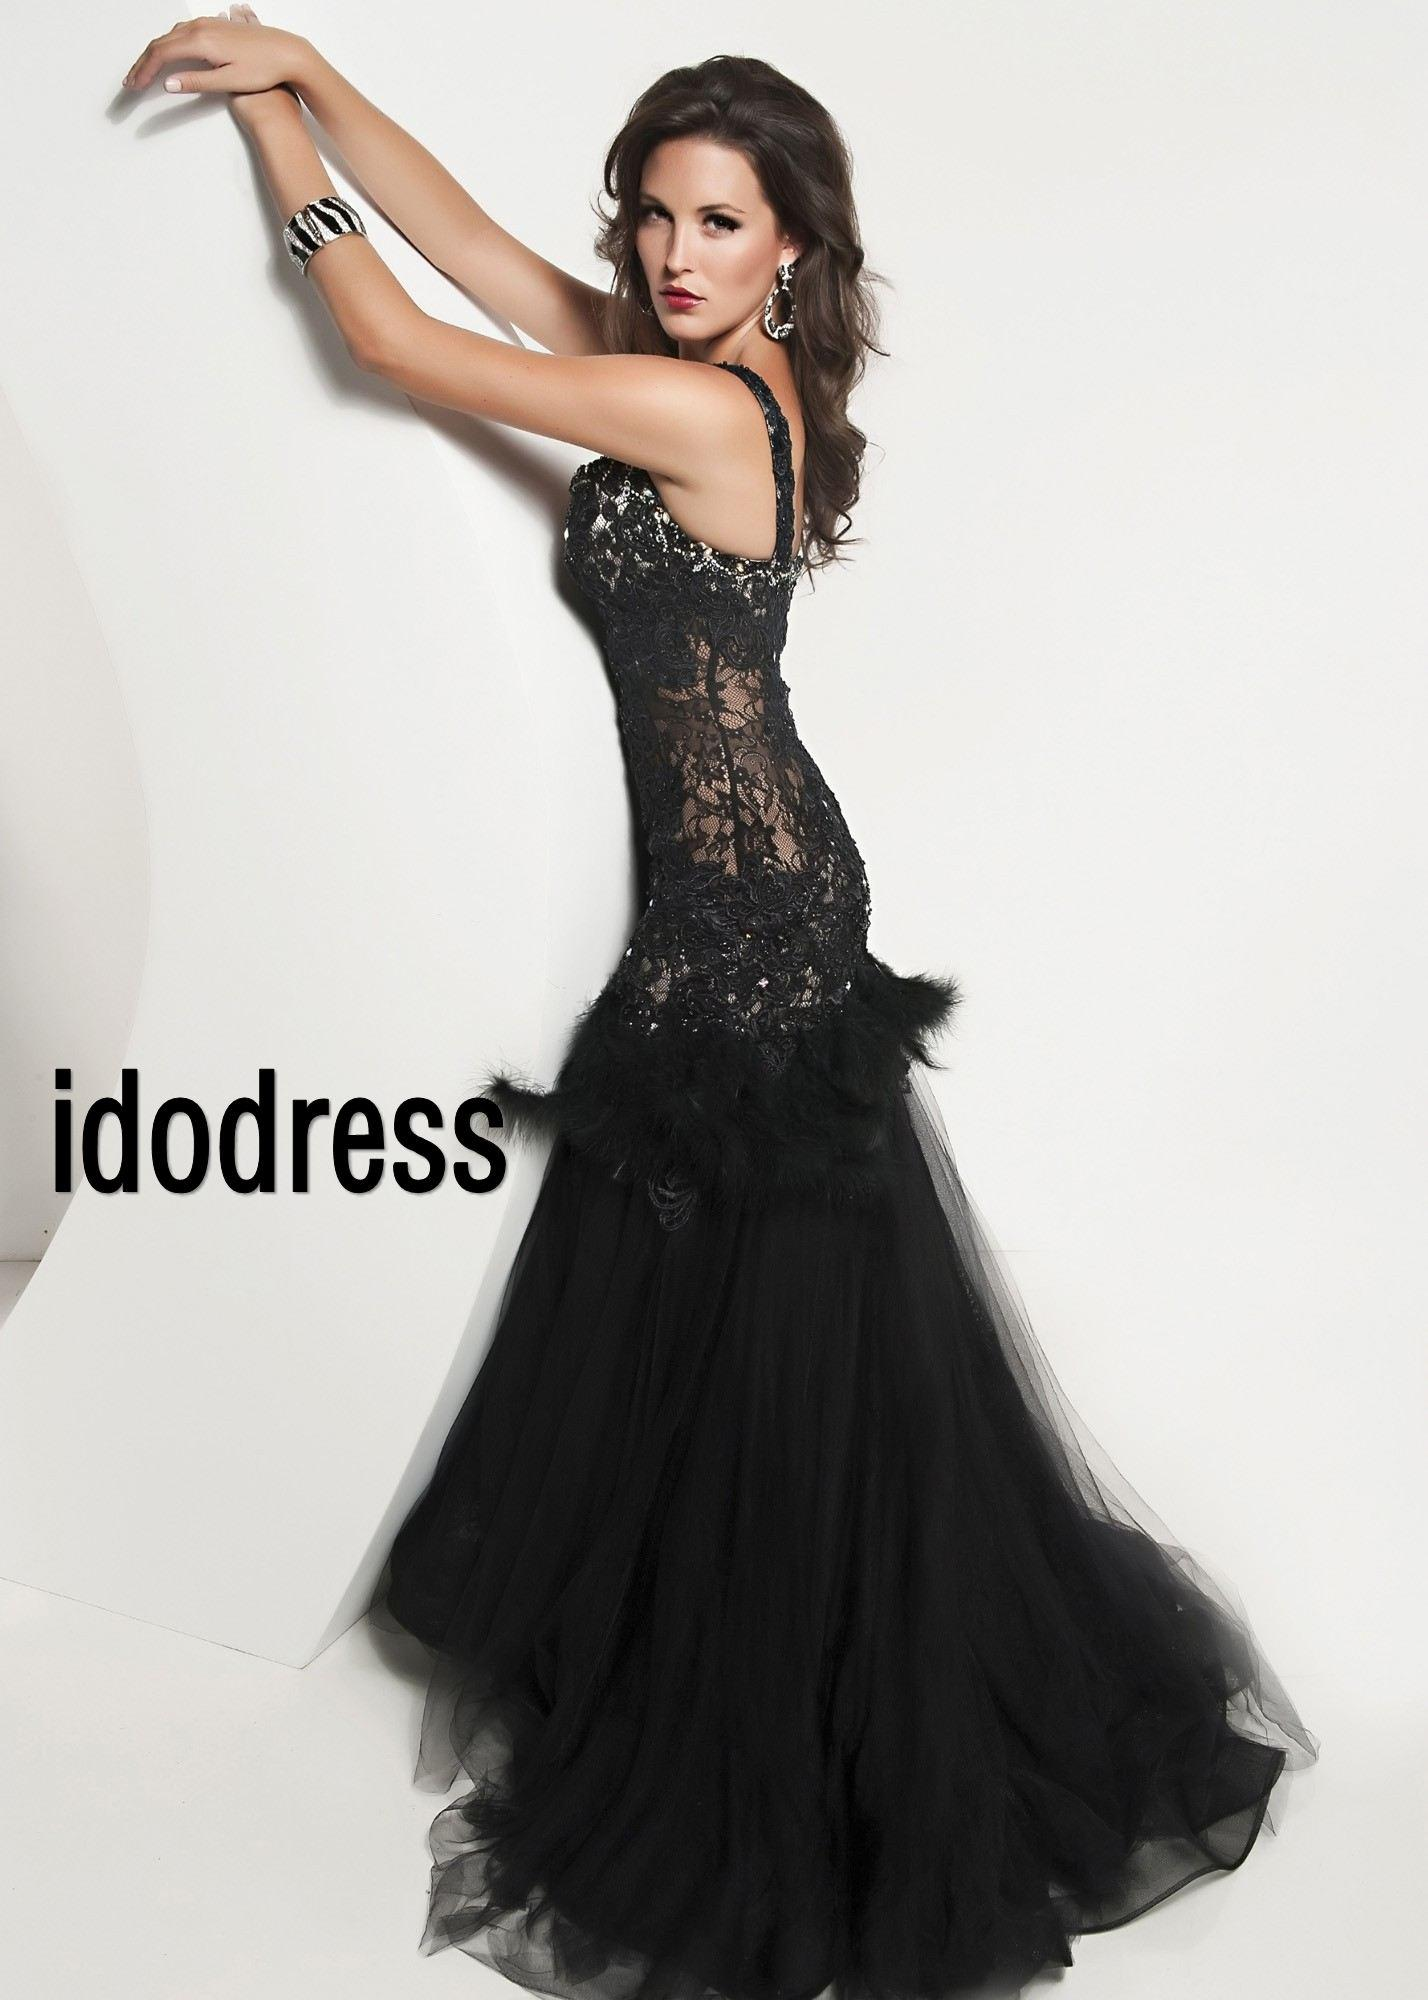 Little Black Dresses - The little black dress - a classic that never gets old. Shop for dresses at Le Chateau.